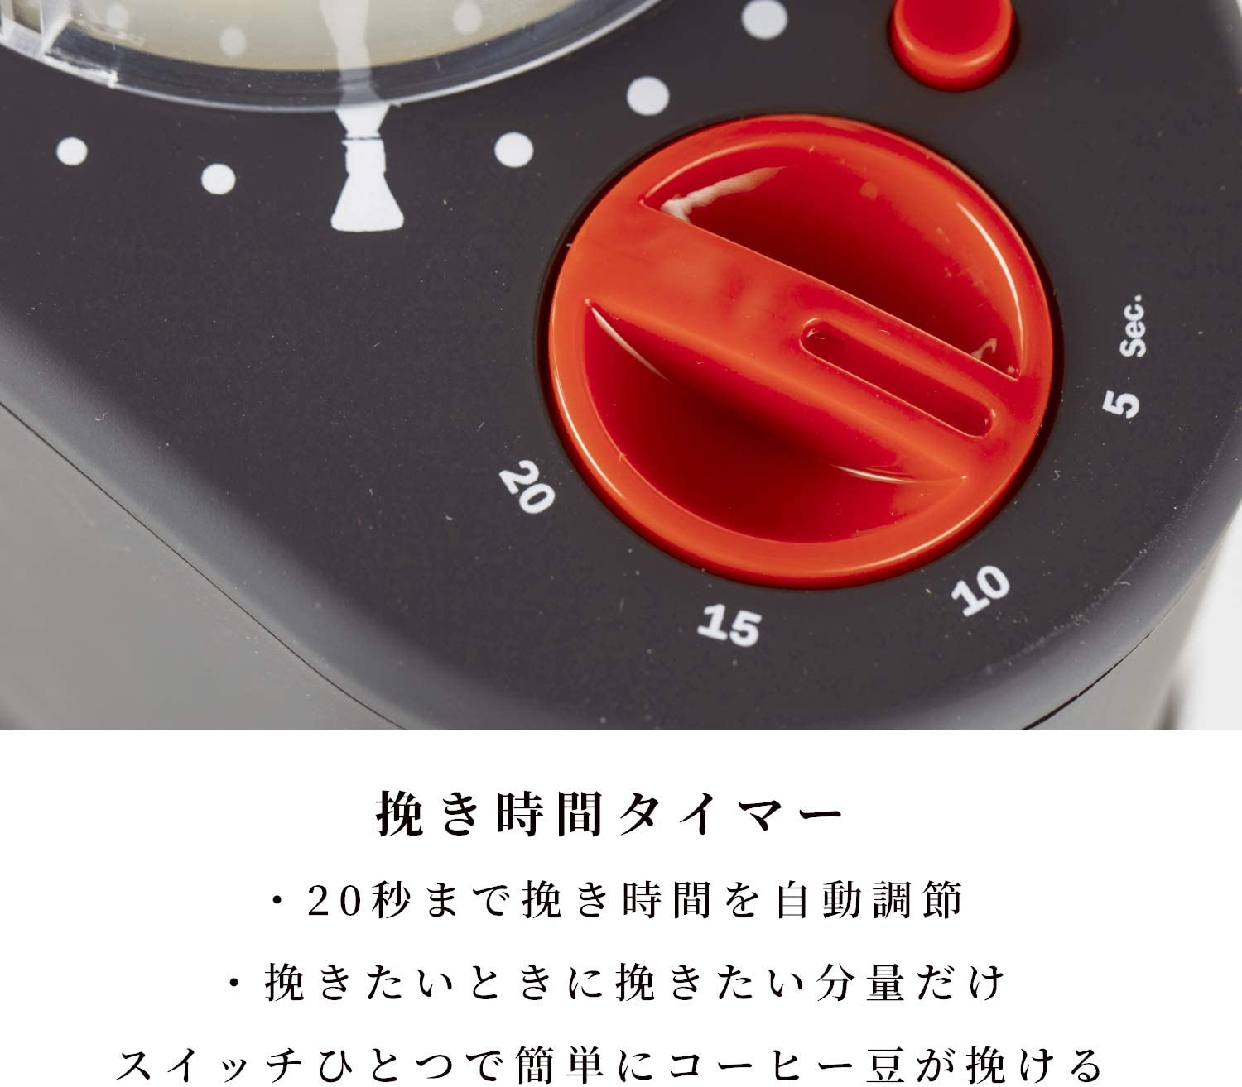 bodum(ボダム) BISTRO コーヒーグラインダー 10903-01JP-3の商品画像3